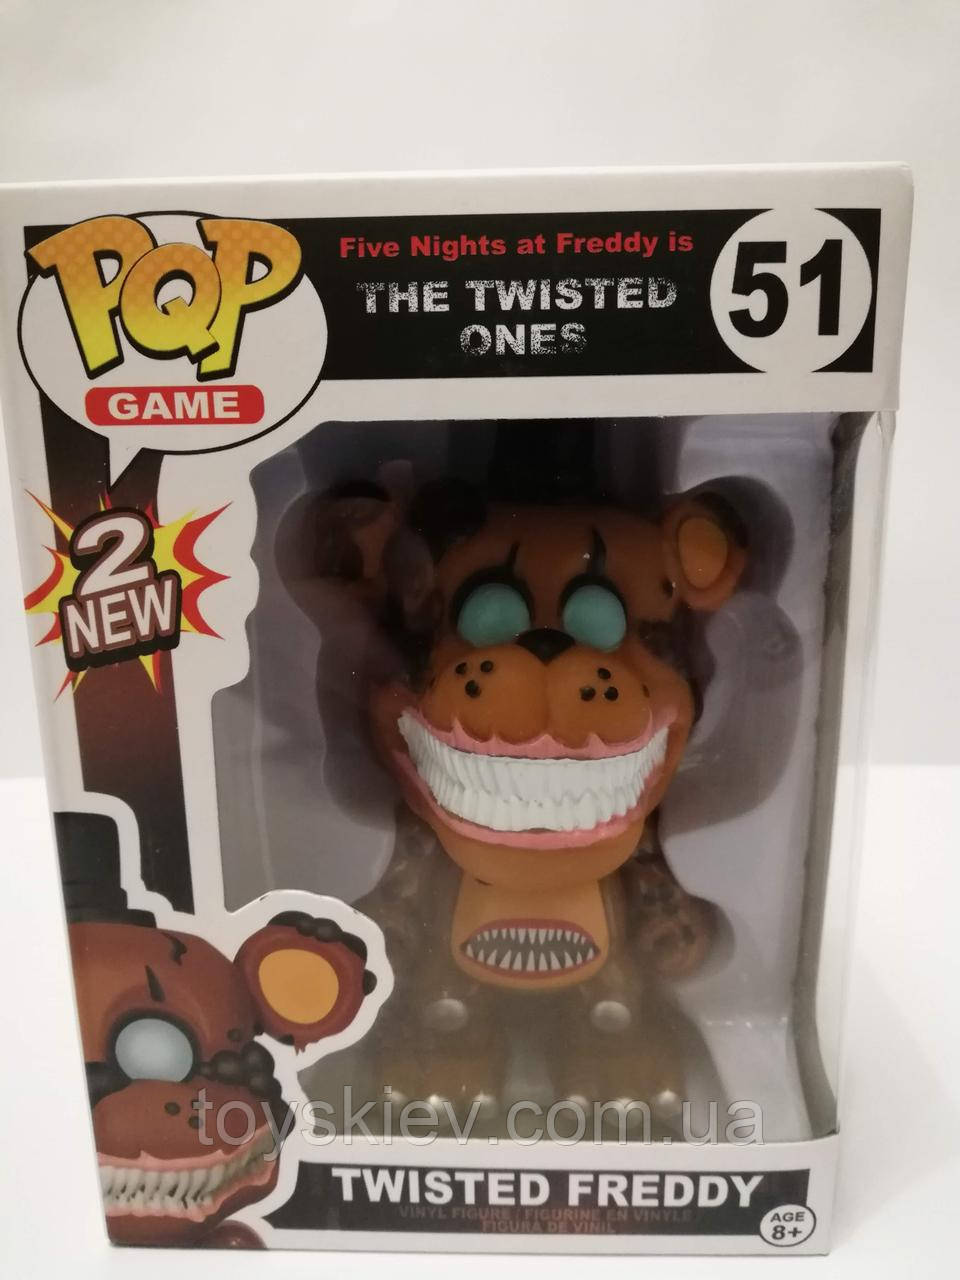 Фигурки 5 пять ночей с Фредди Funko POP Games Five Nights at Freddy's аналог 002-8-51